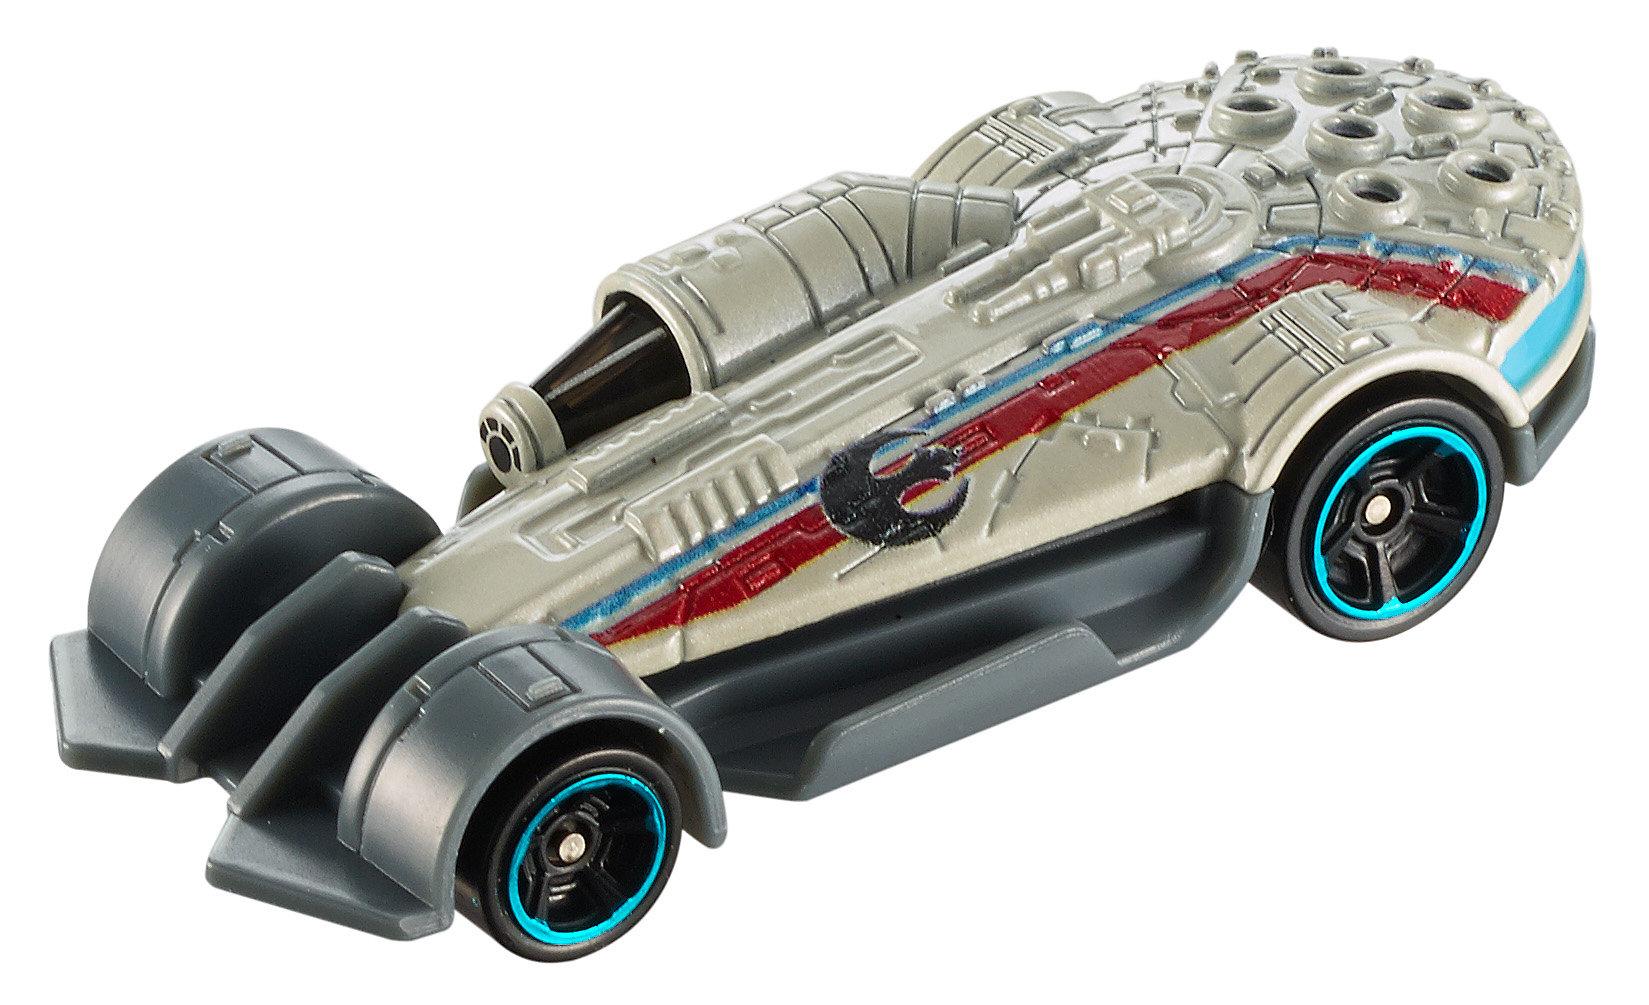 Hot Wheels Star Wars Carships Millennium Falcon Vehicle by Mattel